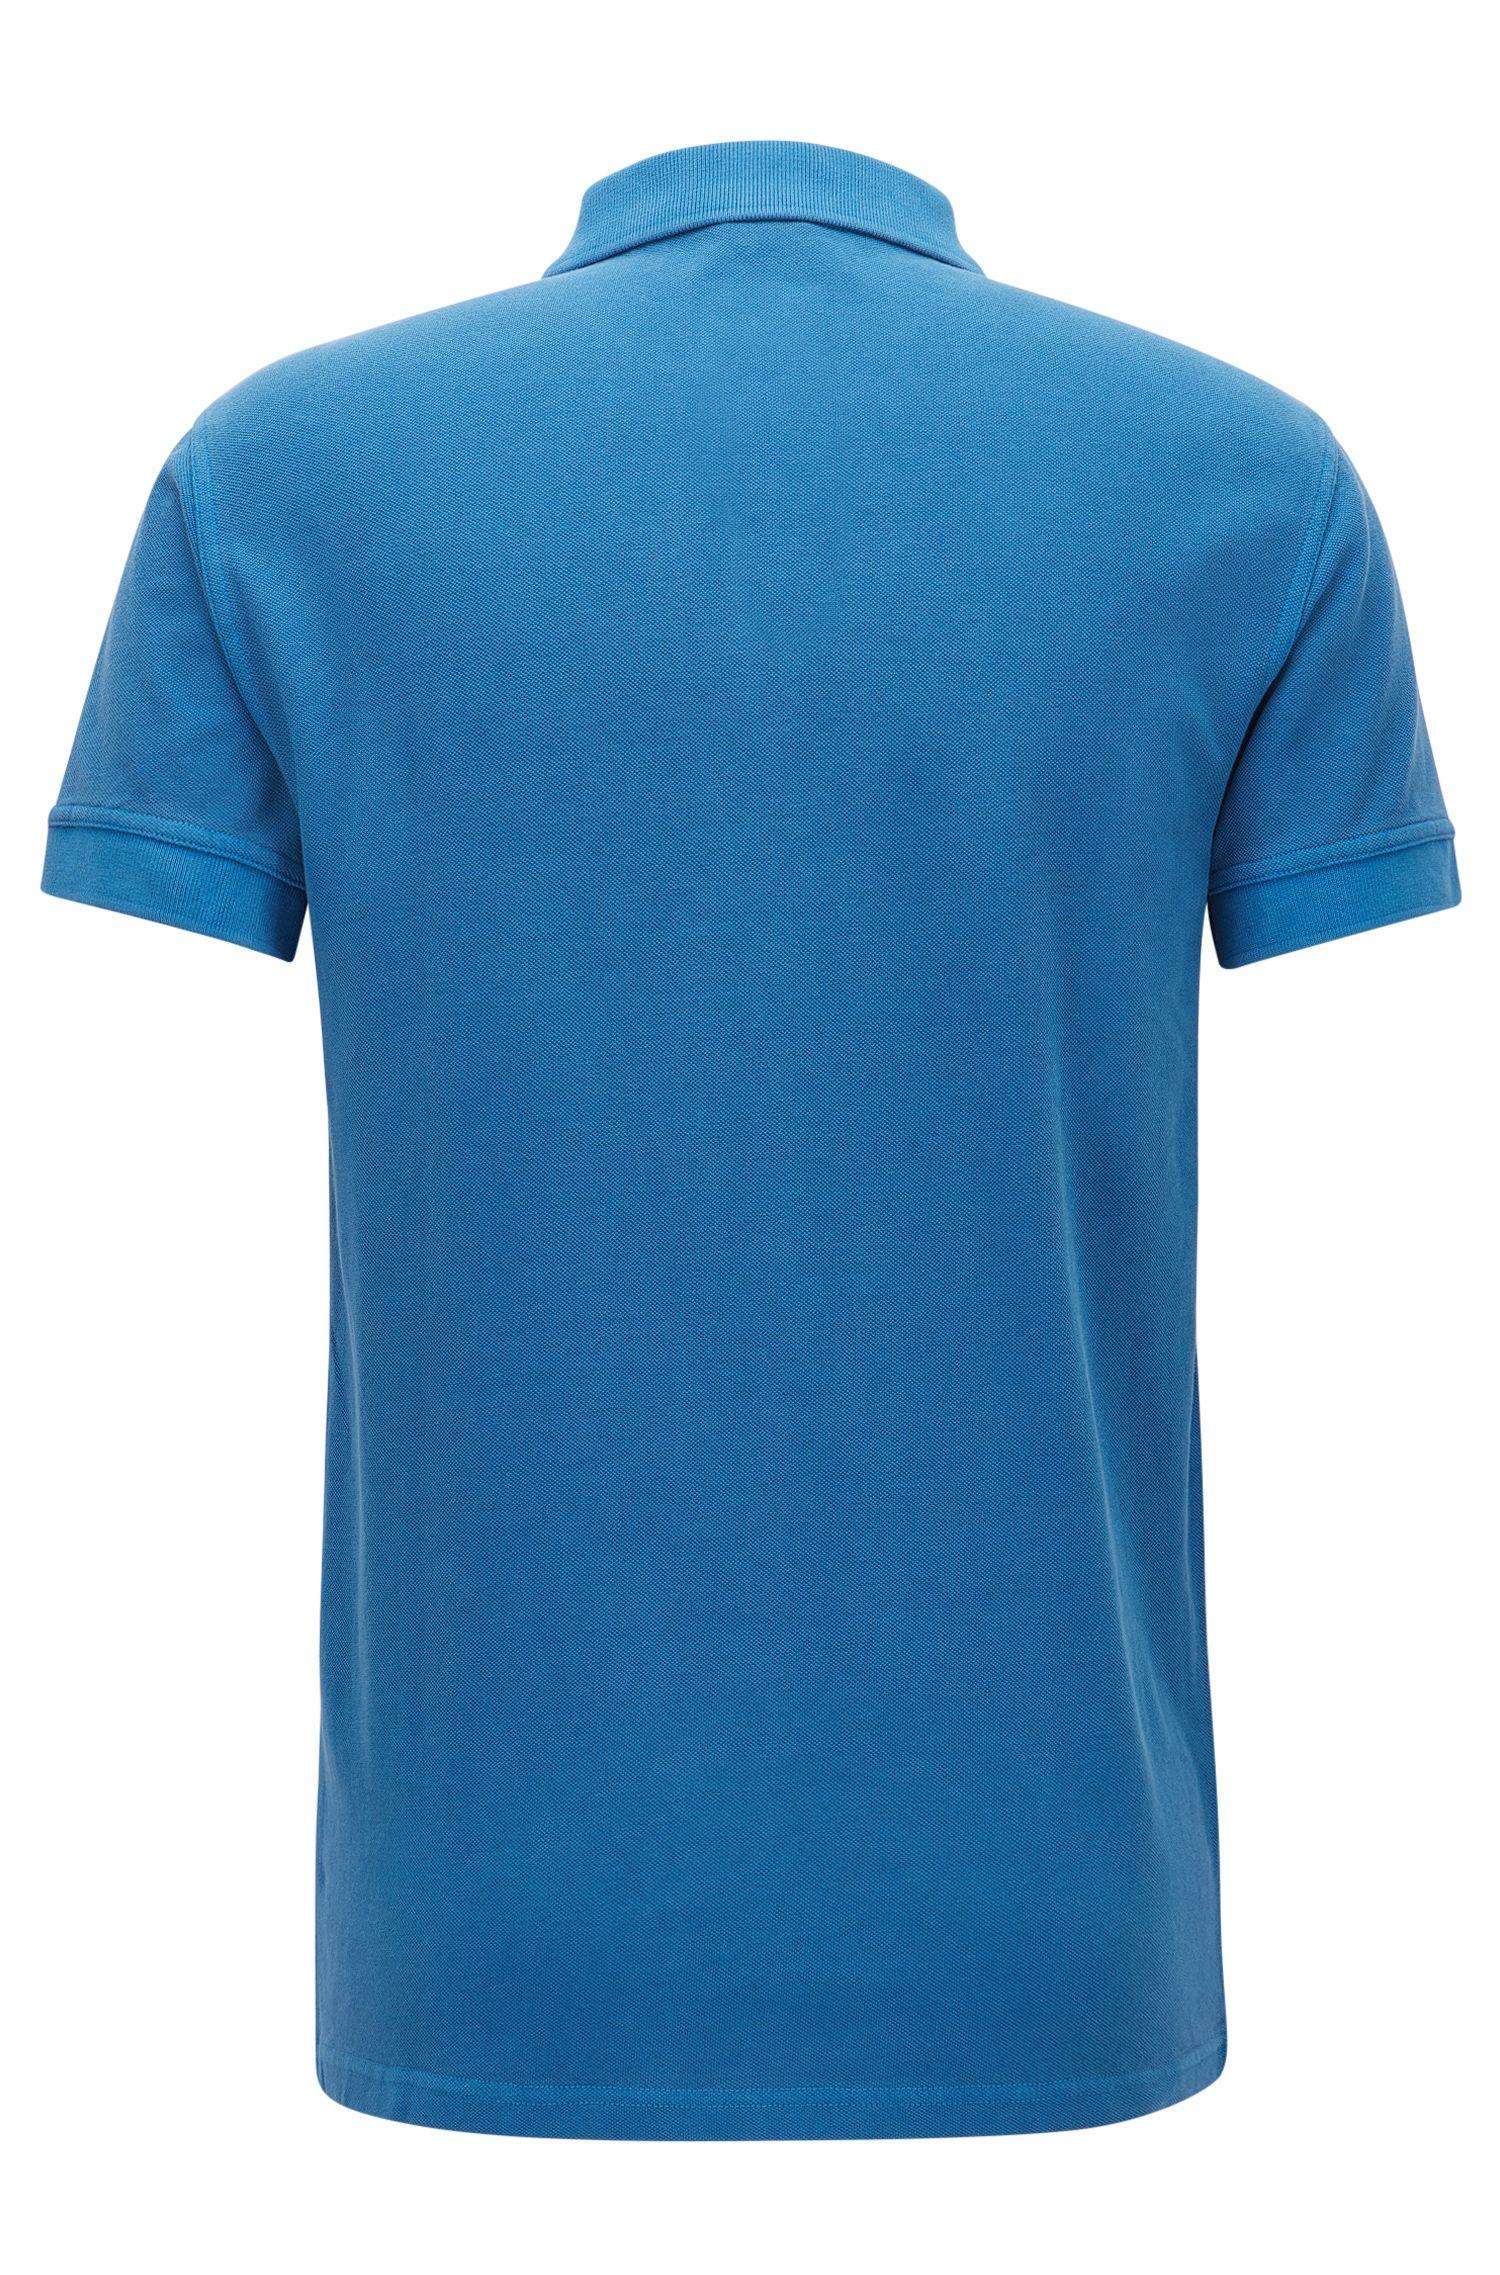 Cotton Polo Shirt, Slim Fit | Pascha, Dark Blue